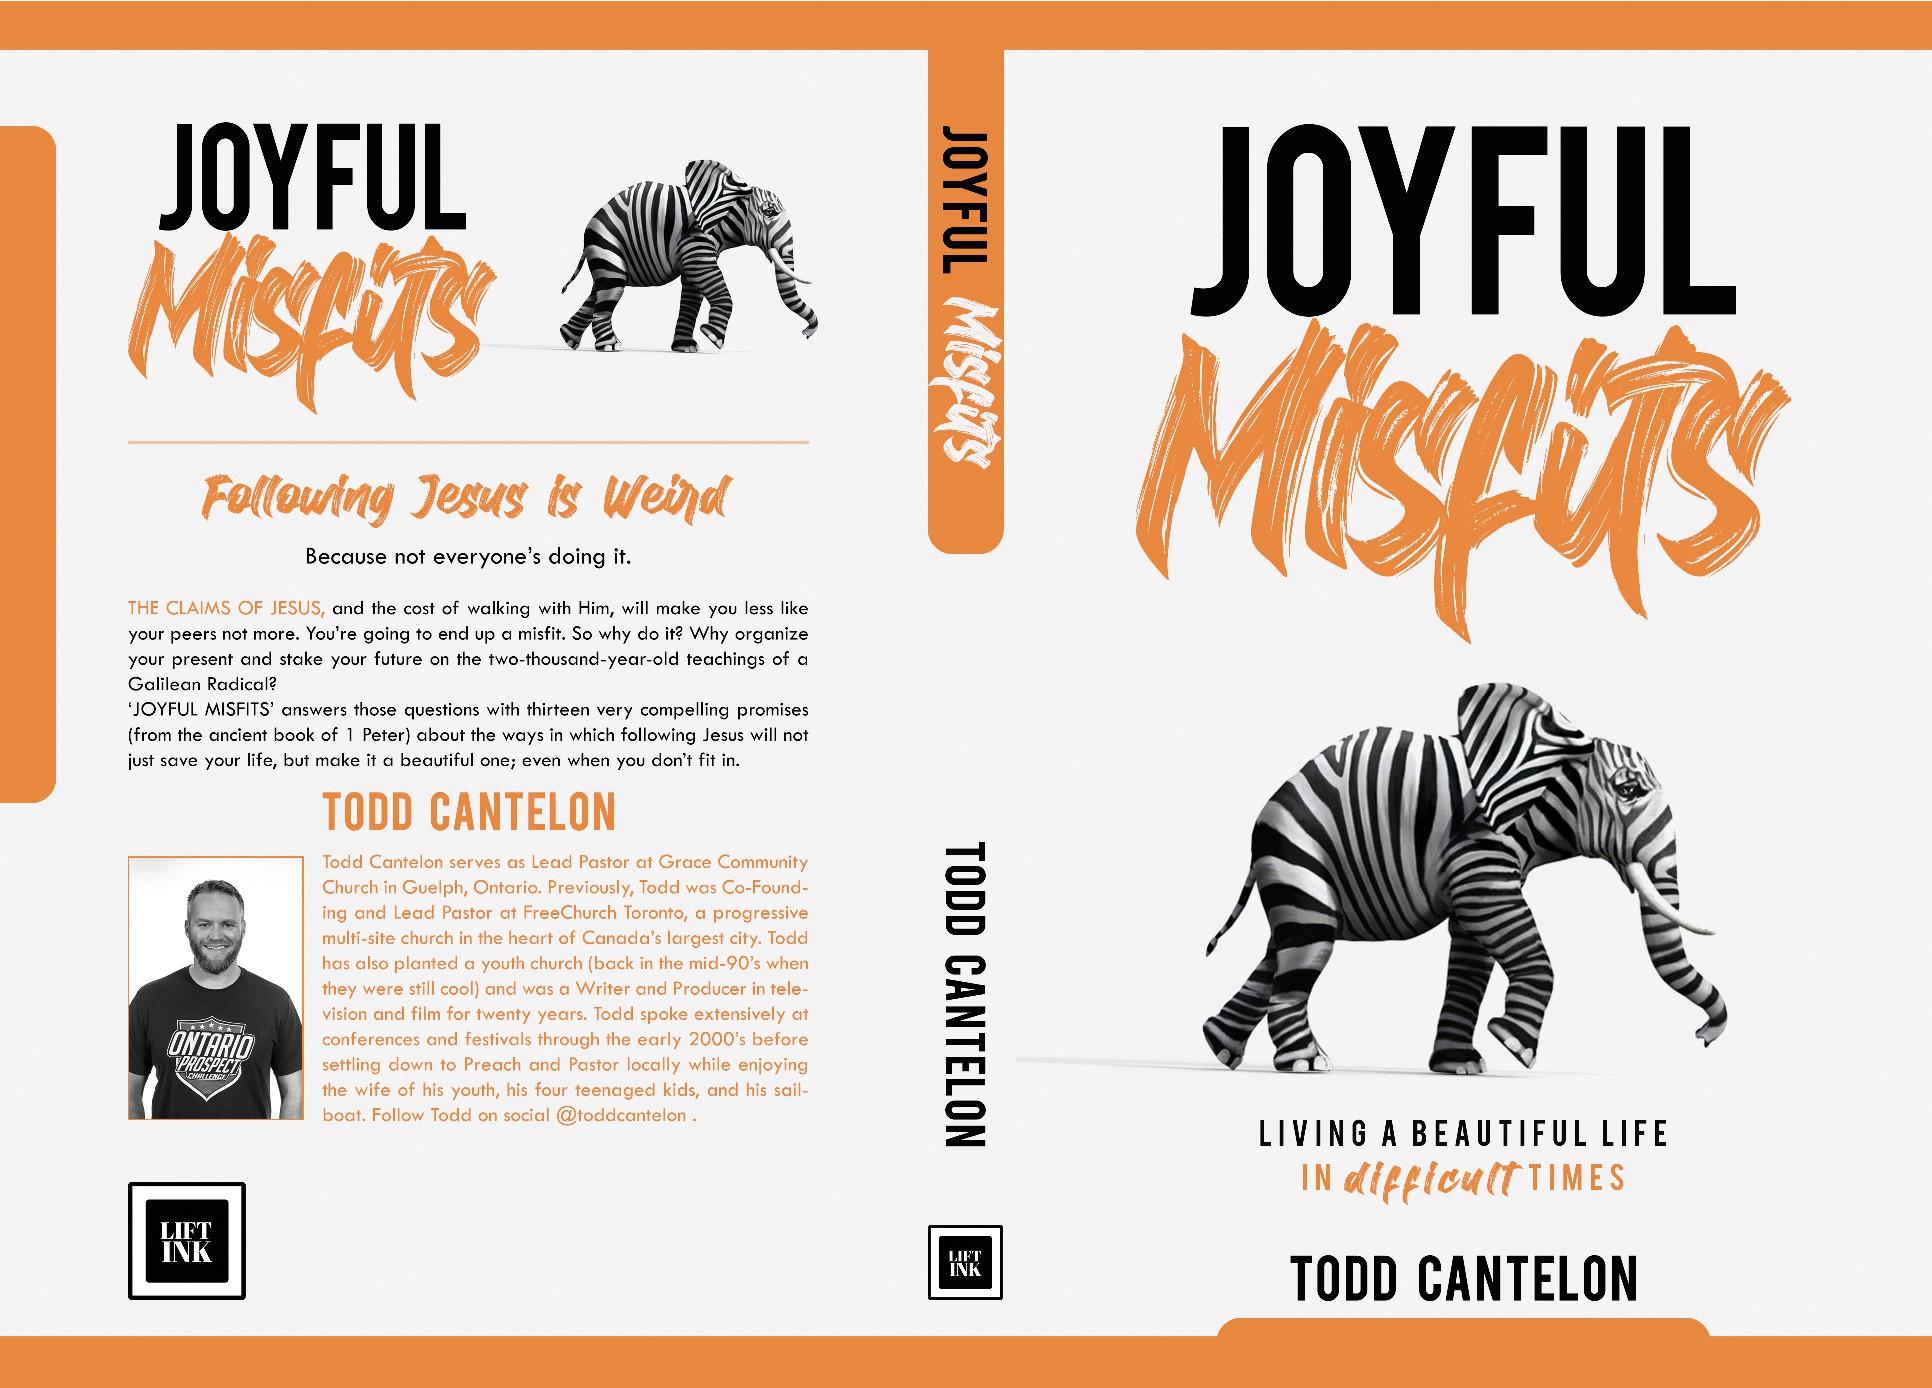 Design a book cover for a faith-based book that SPARKS JOY!